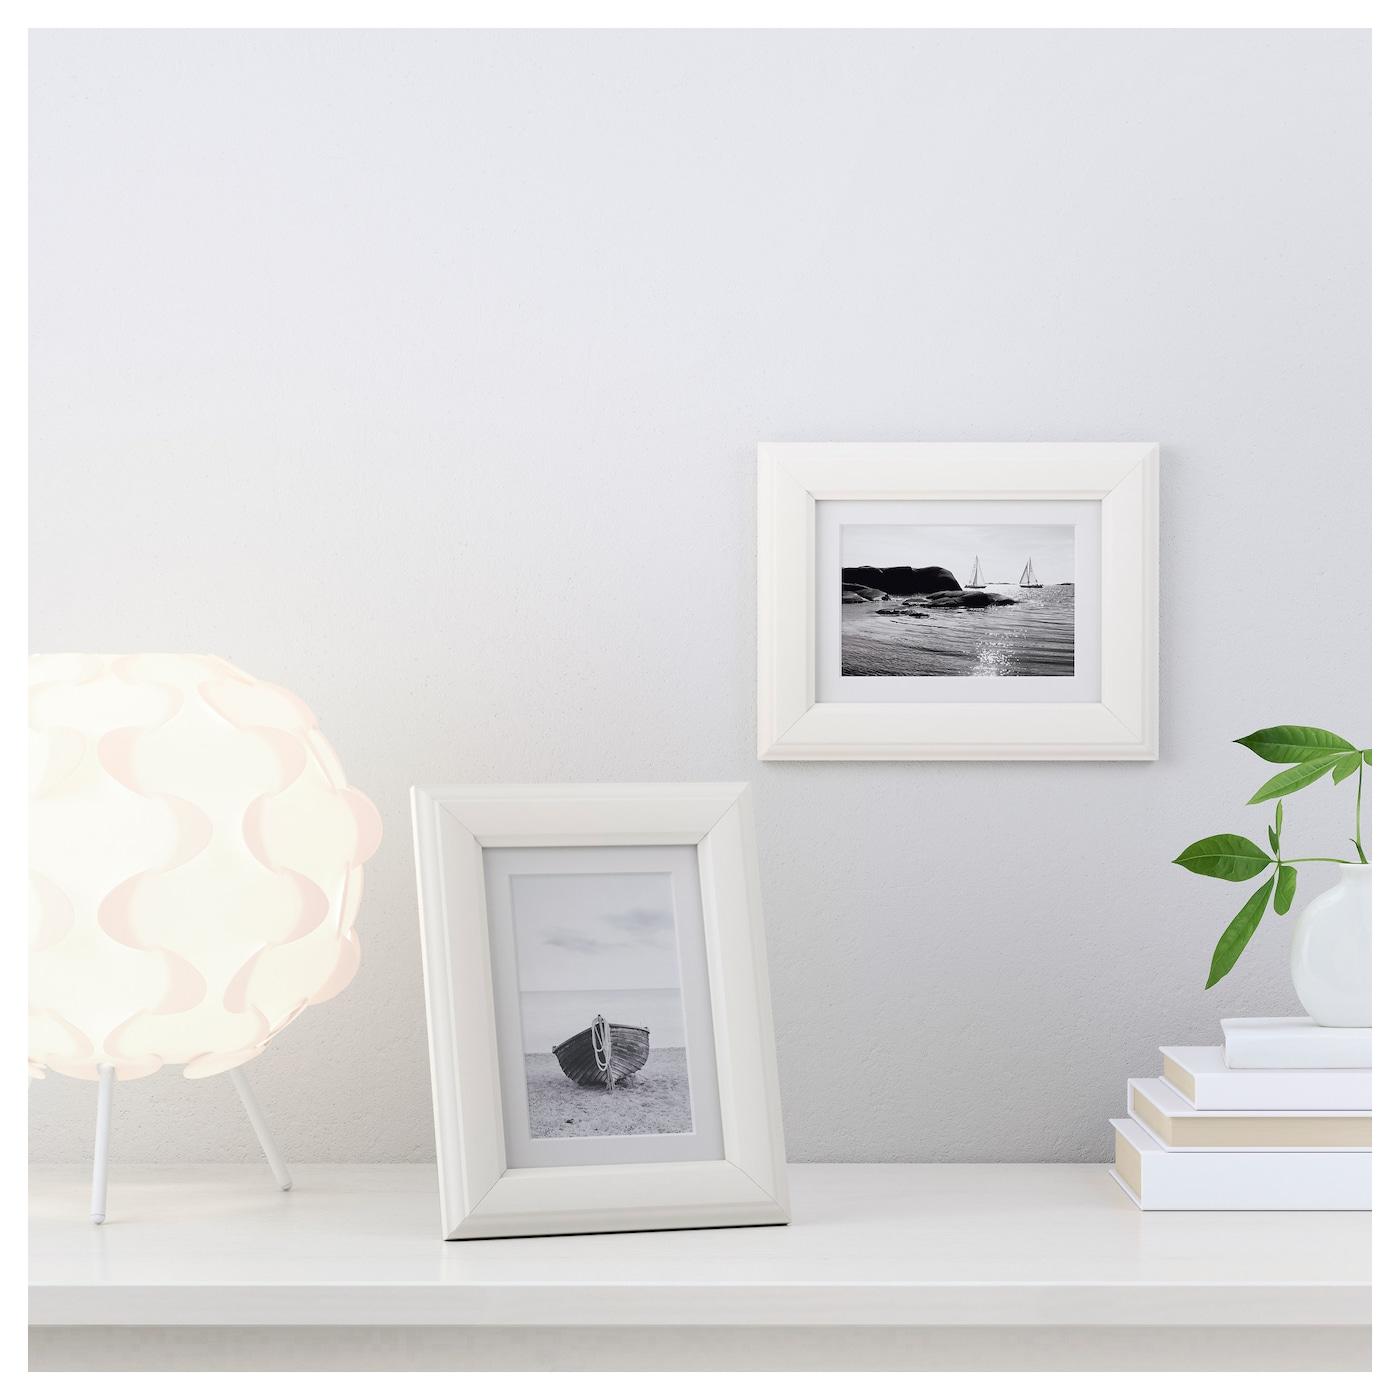 virserum frame white 21 x 30 cm ikea. Black Bedroom Furniture Sets. Home Design Ideas